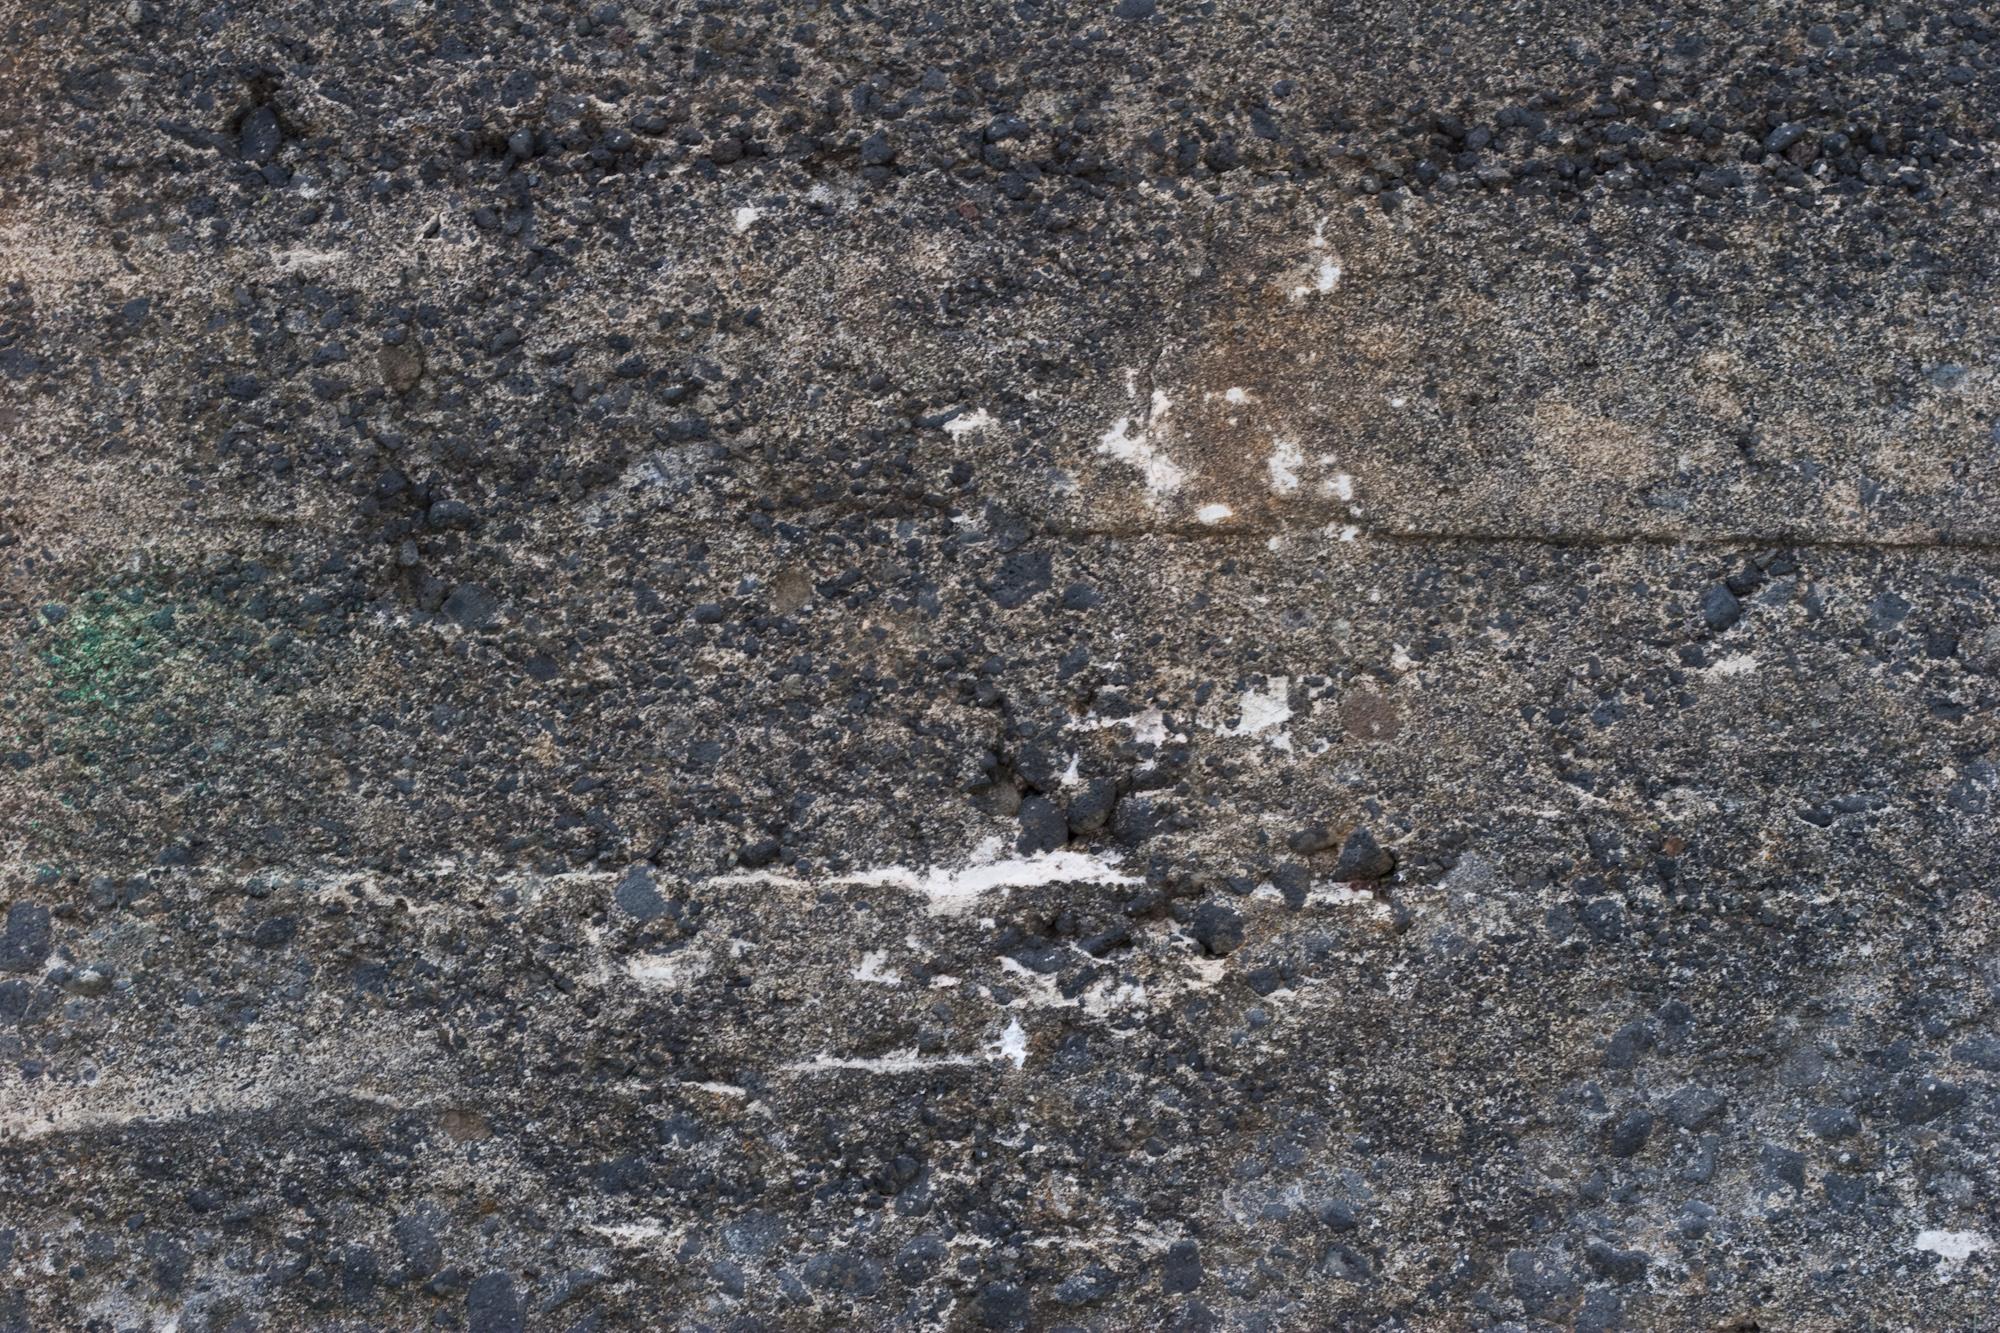 Old Concrete Block, Concrete, Rust, Weathered, Texture, HQ Photo